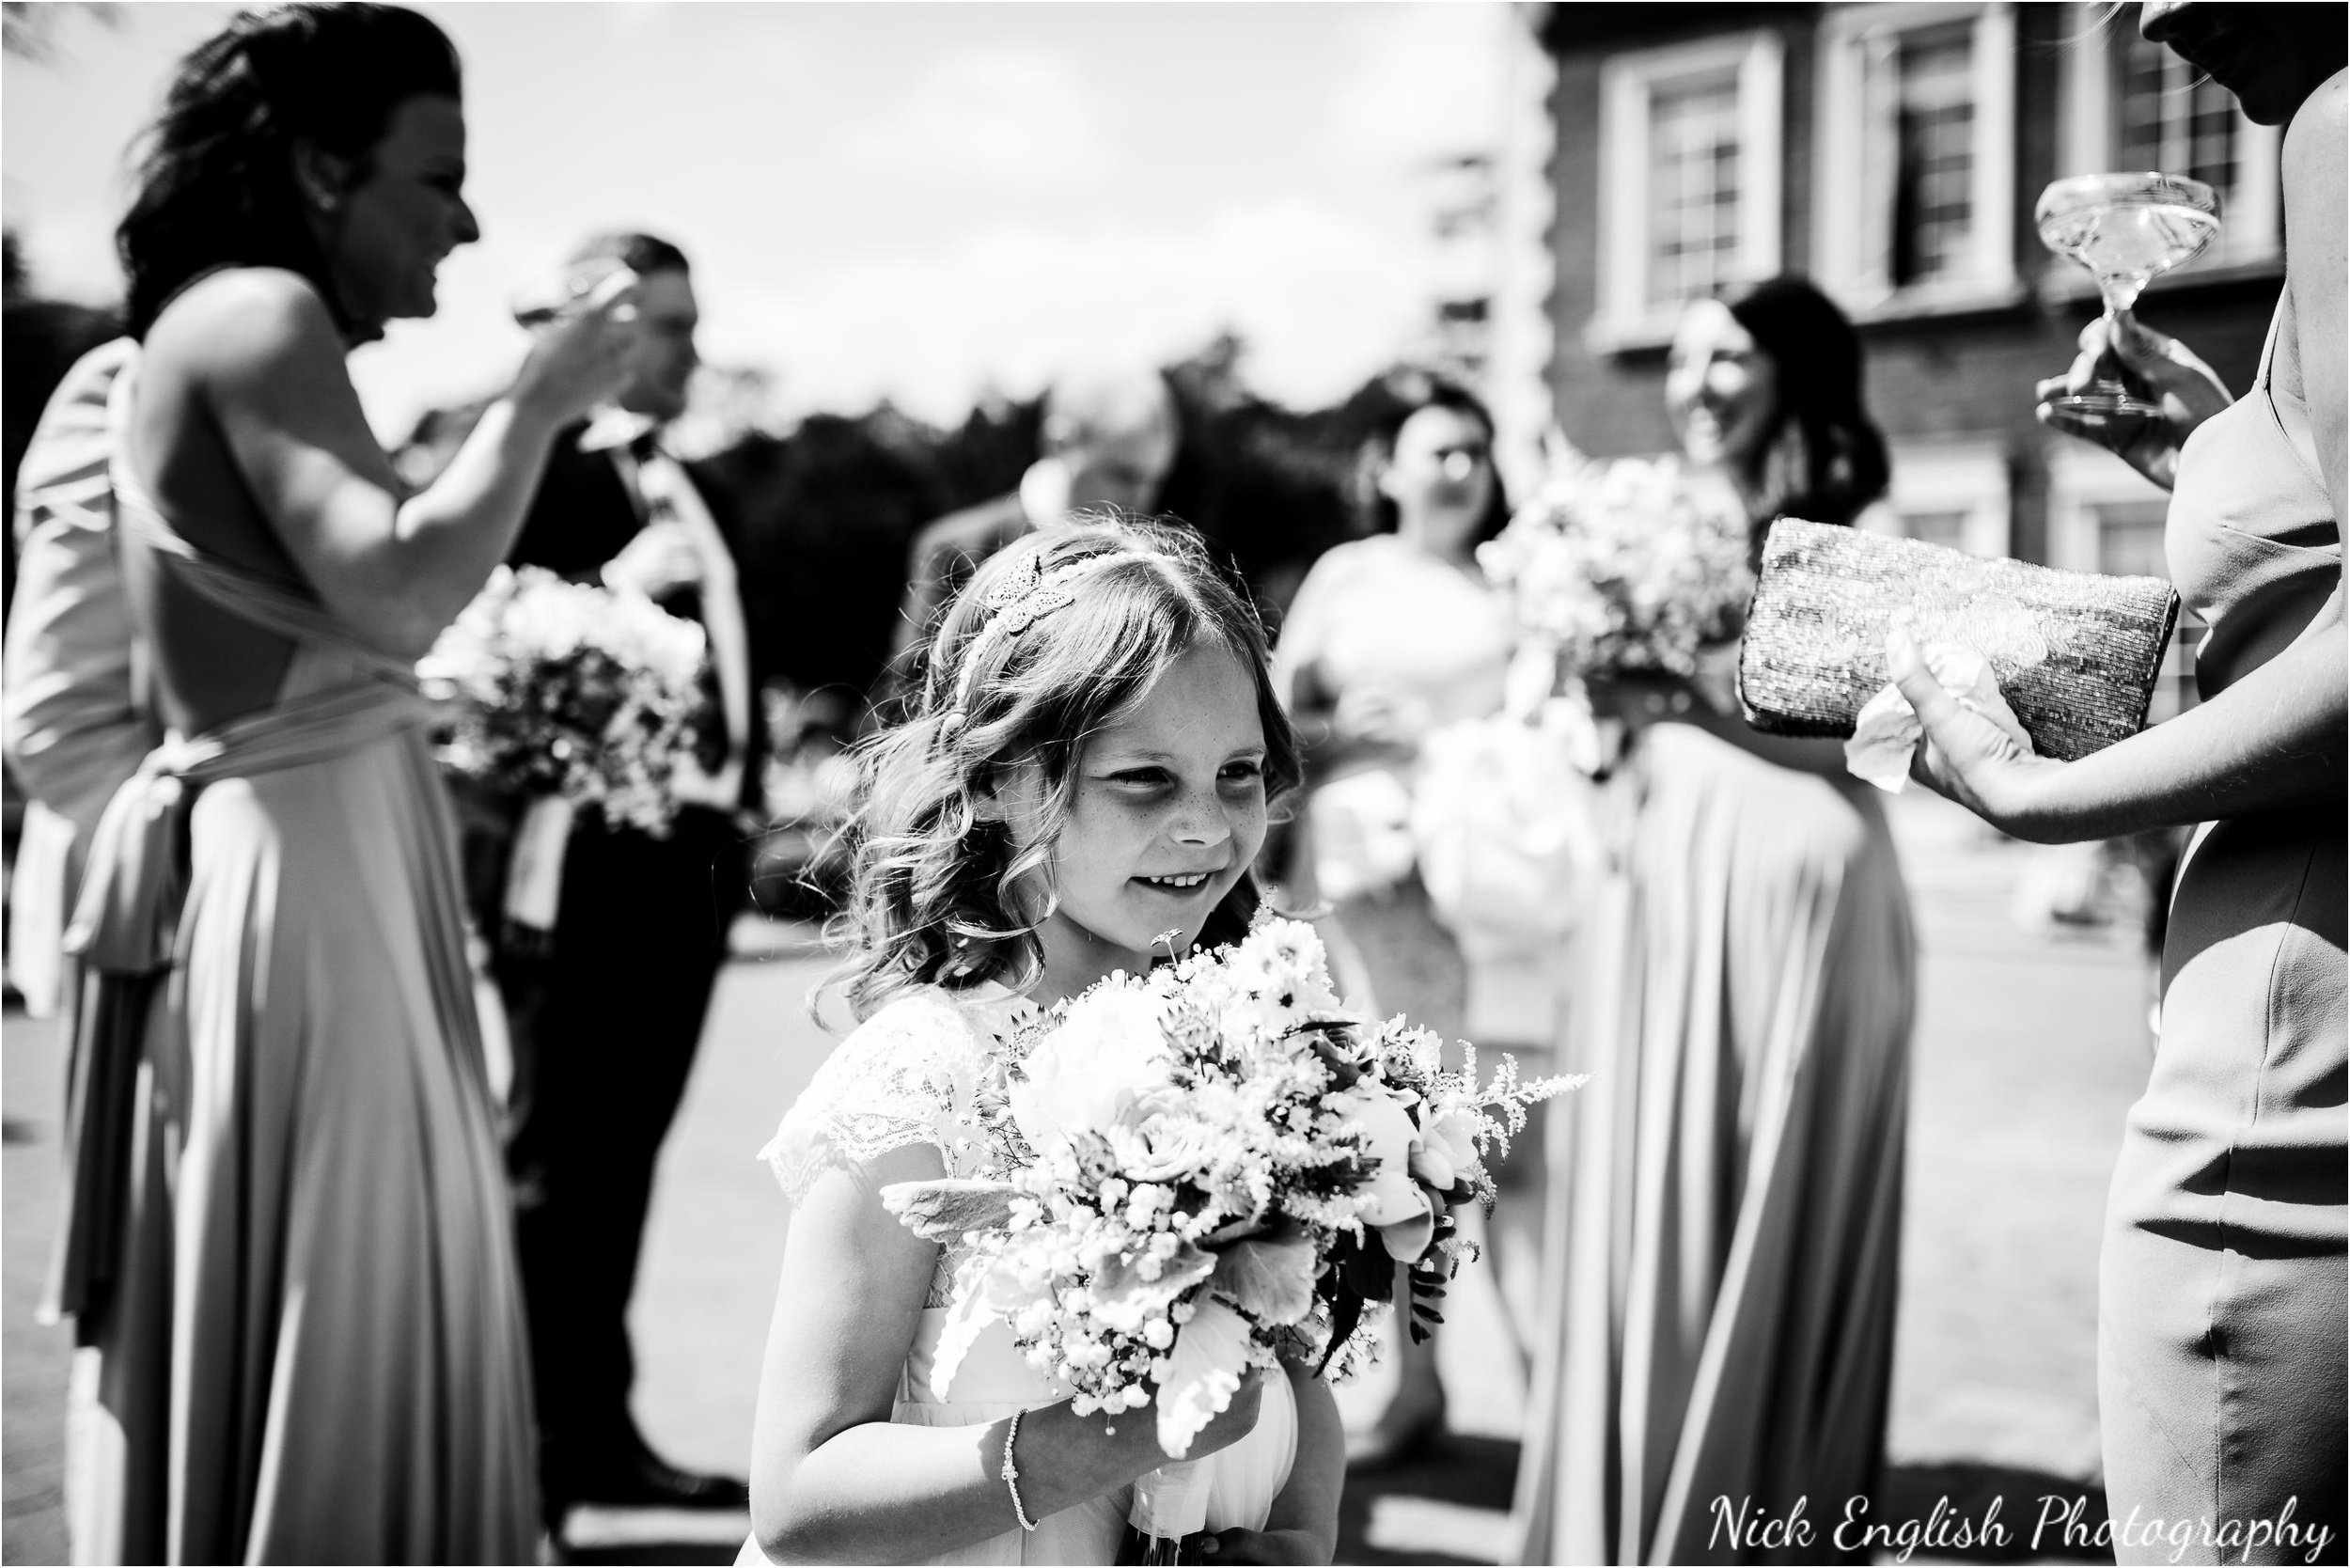 Alison James Wedding Photographs at Eaves Hall West Bradford 119jpg.jpeg